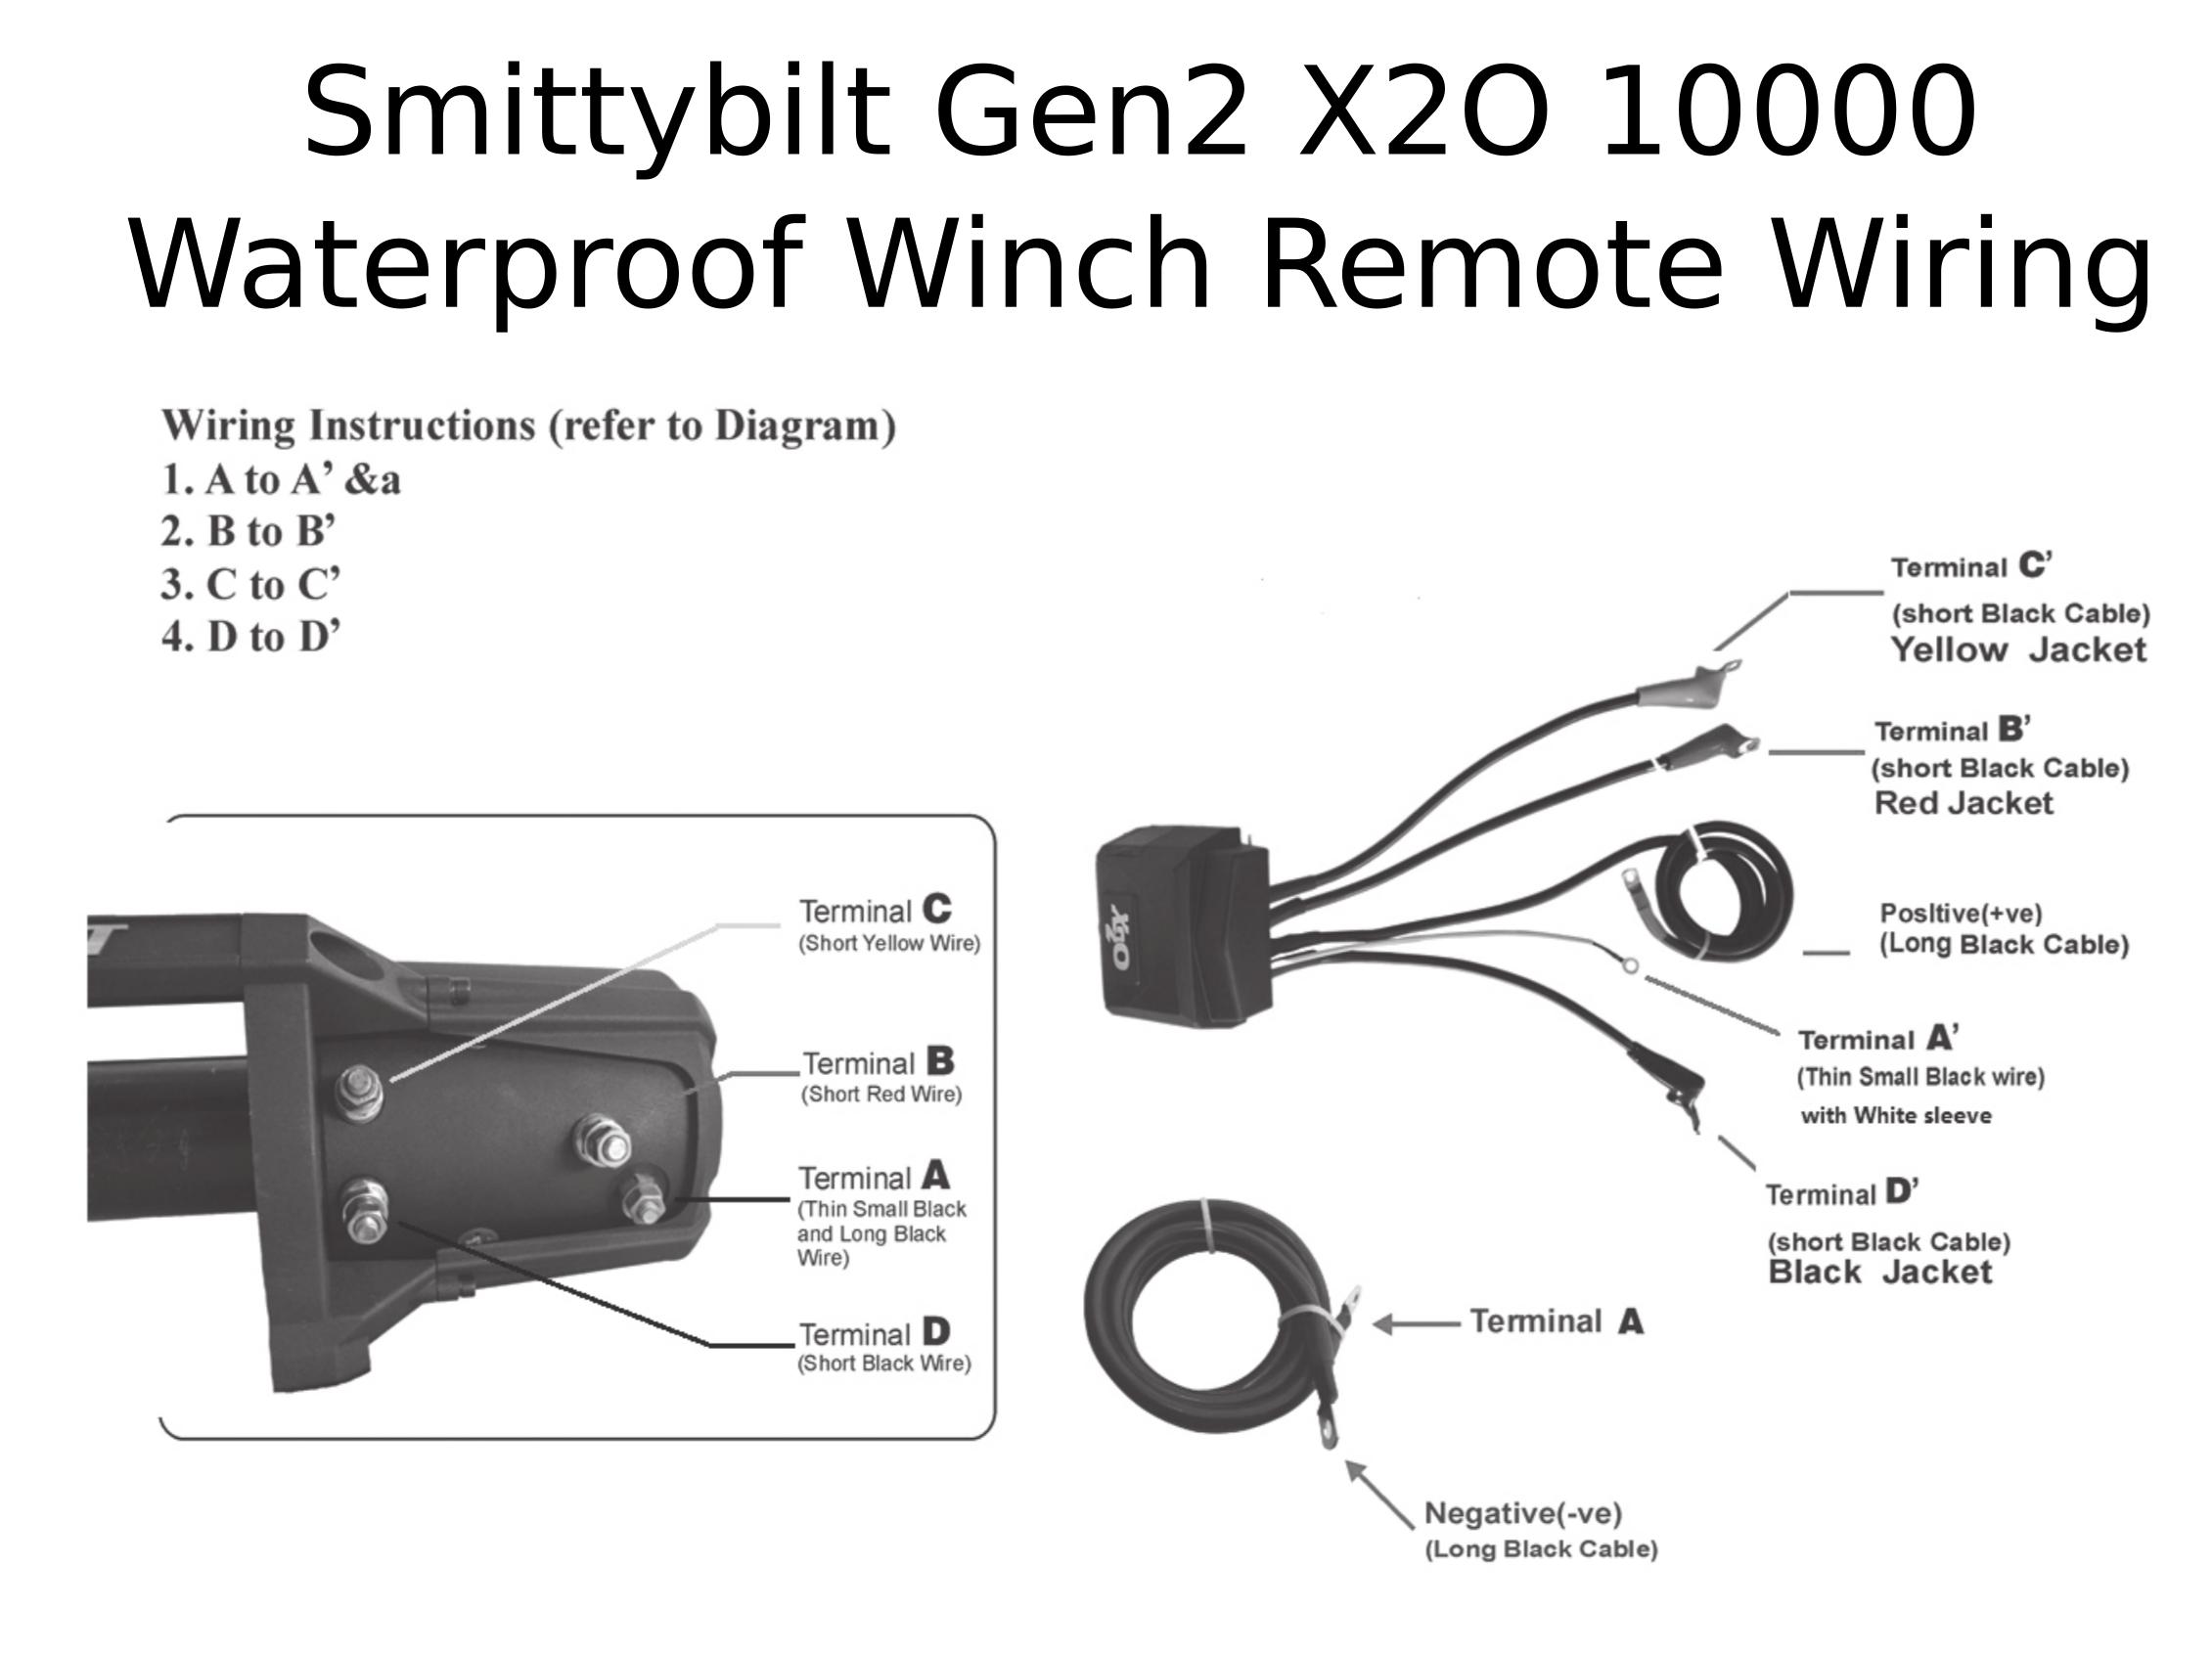 Complete Specs  Smittybilt Gen2 X2o 10000 Waterproof